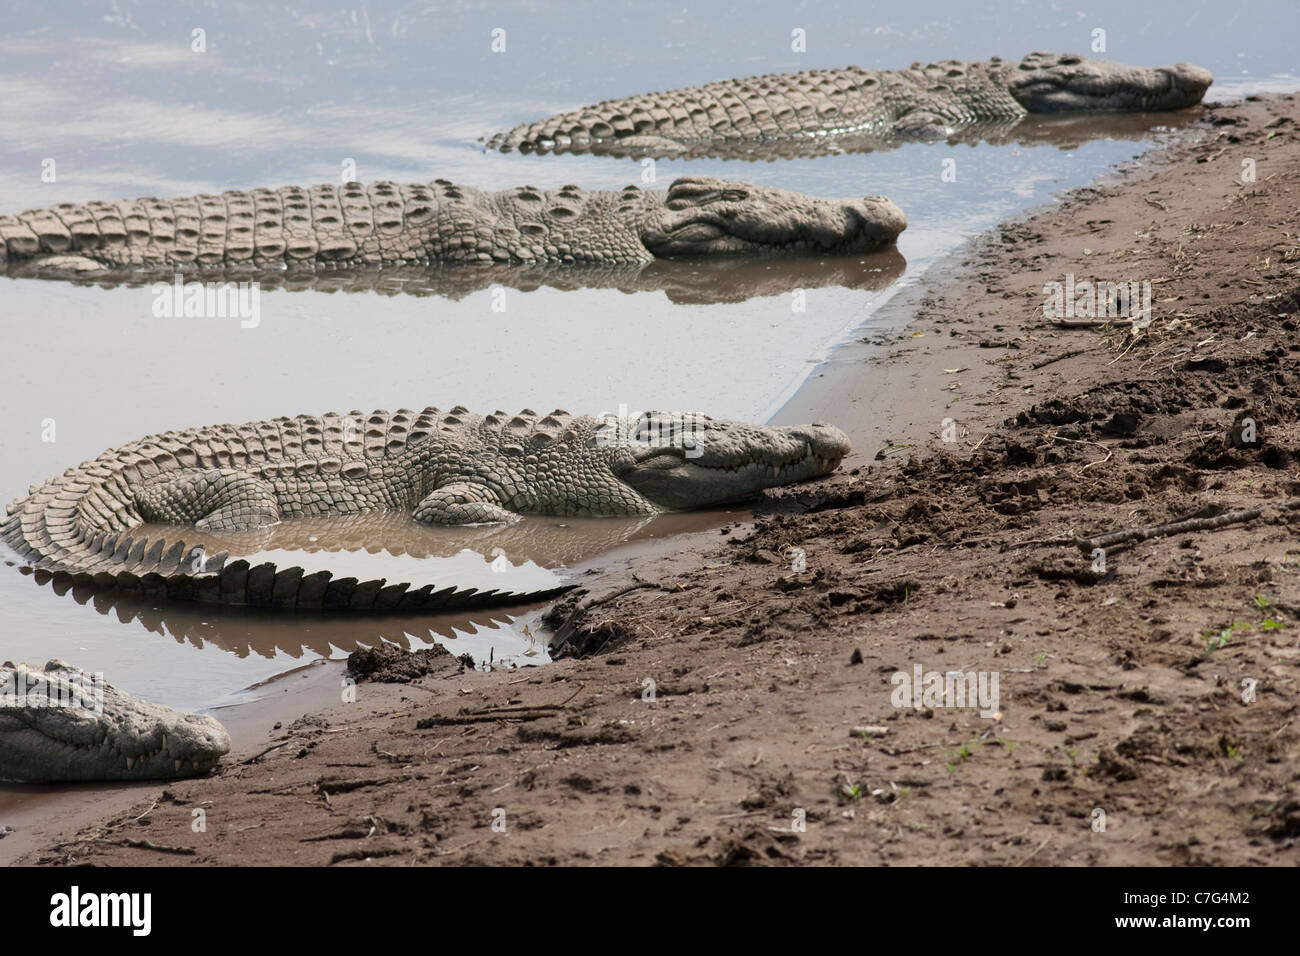 Crocodiles in The Masai Mara National Reserve Kenya Africa. Photo:Jeff Gilbert - Stock Image